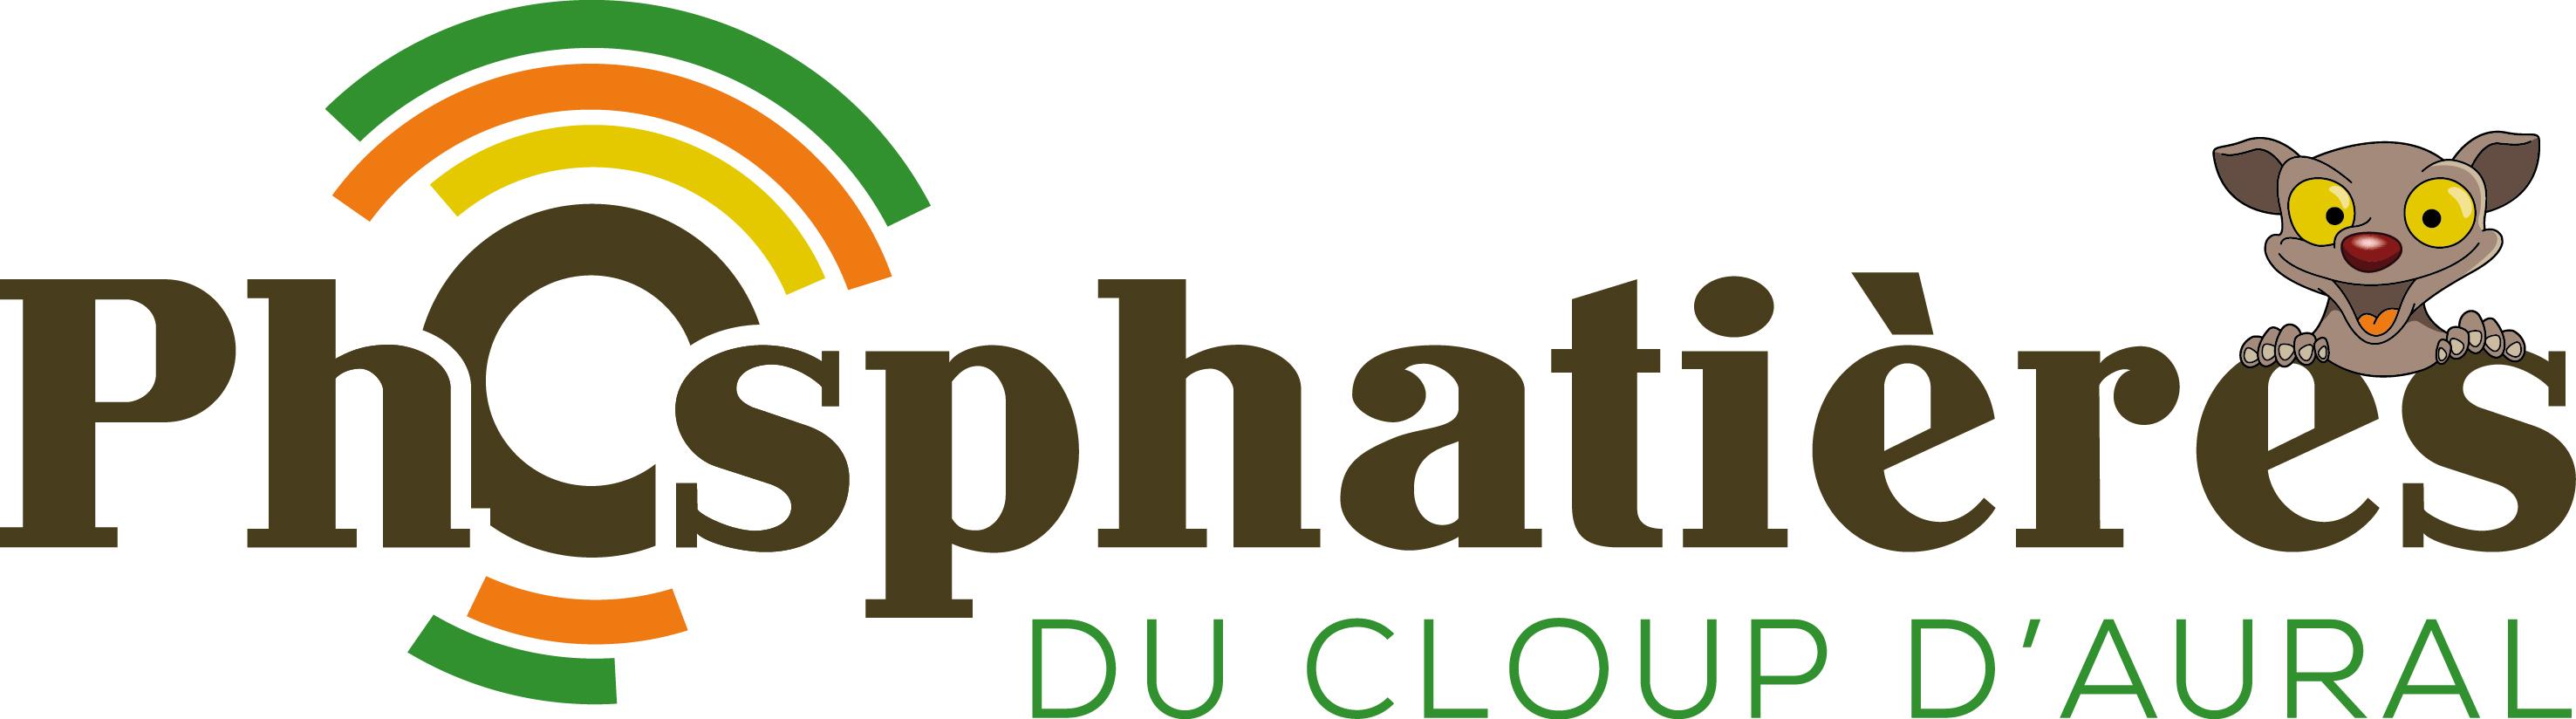 logo phosphatieres quadri